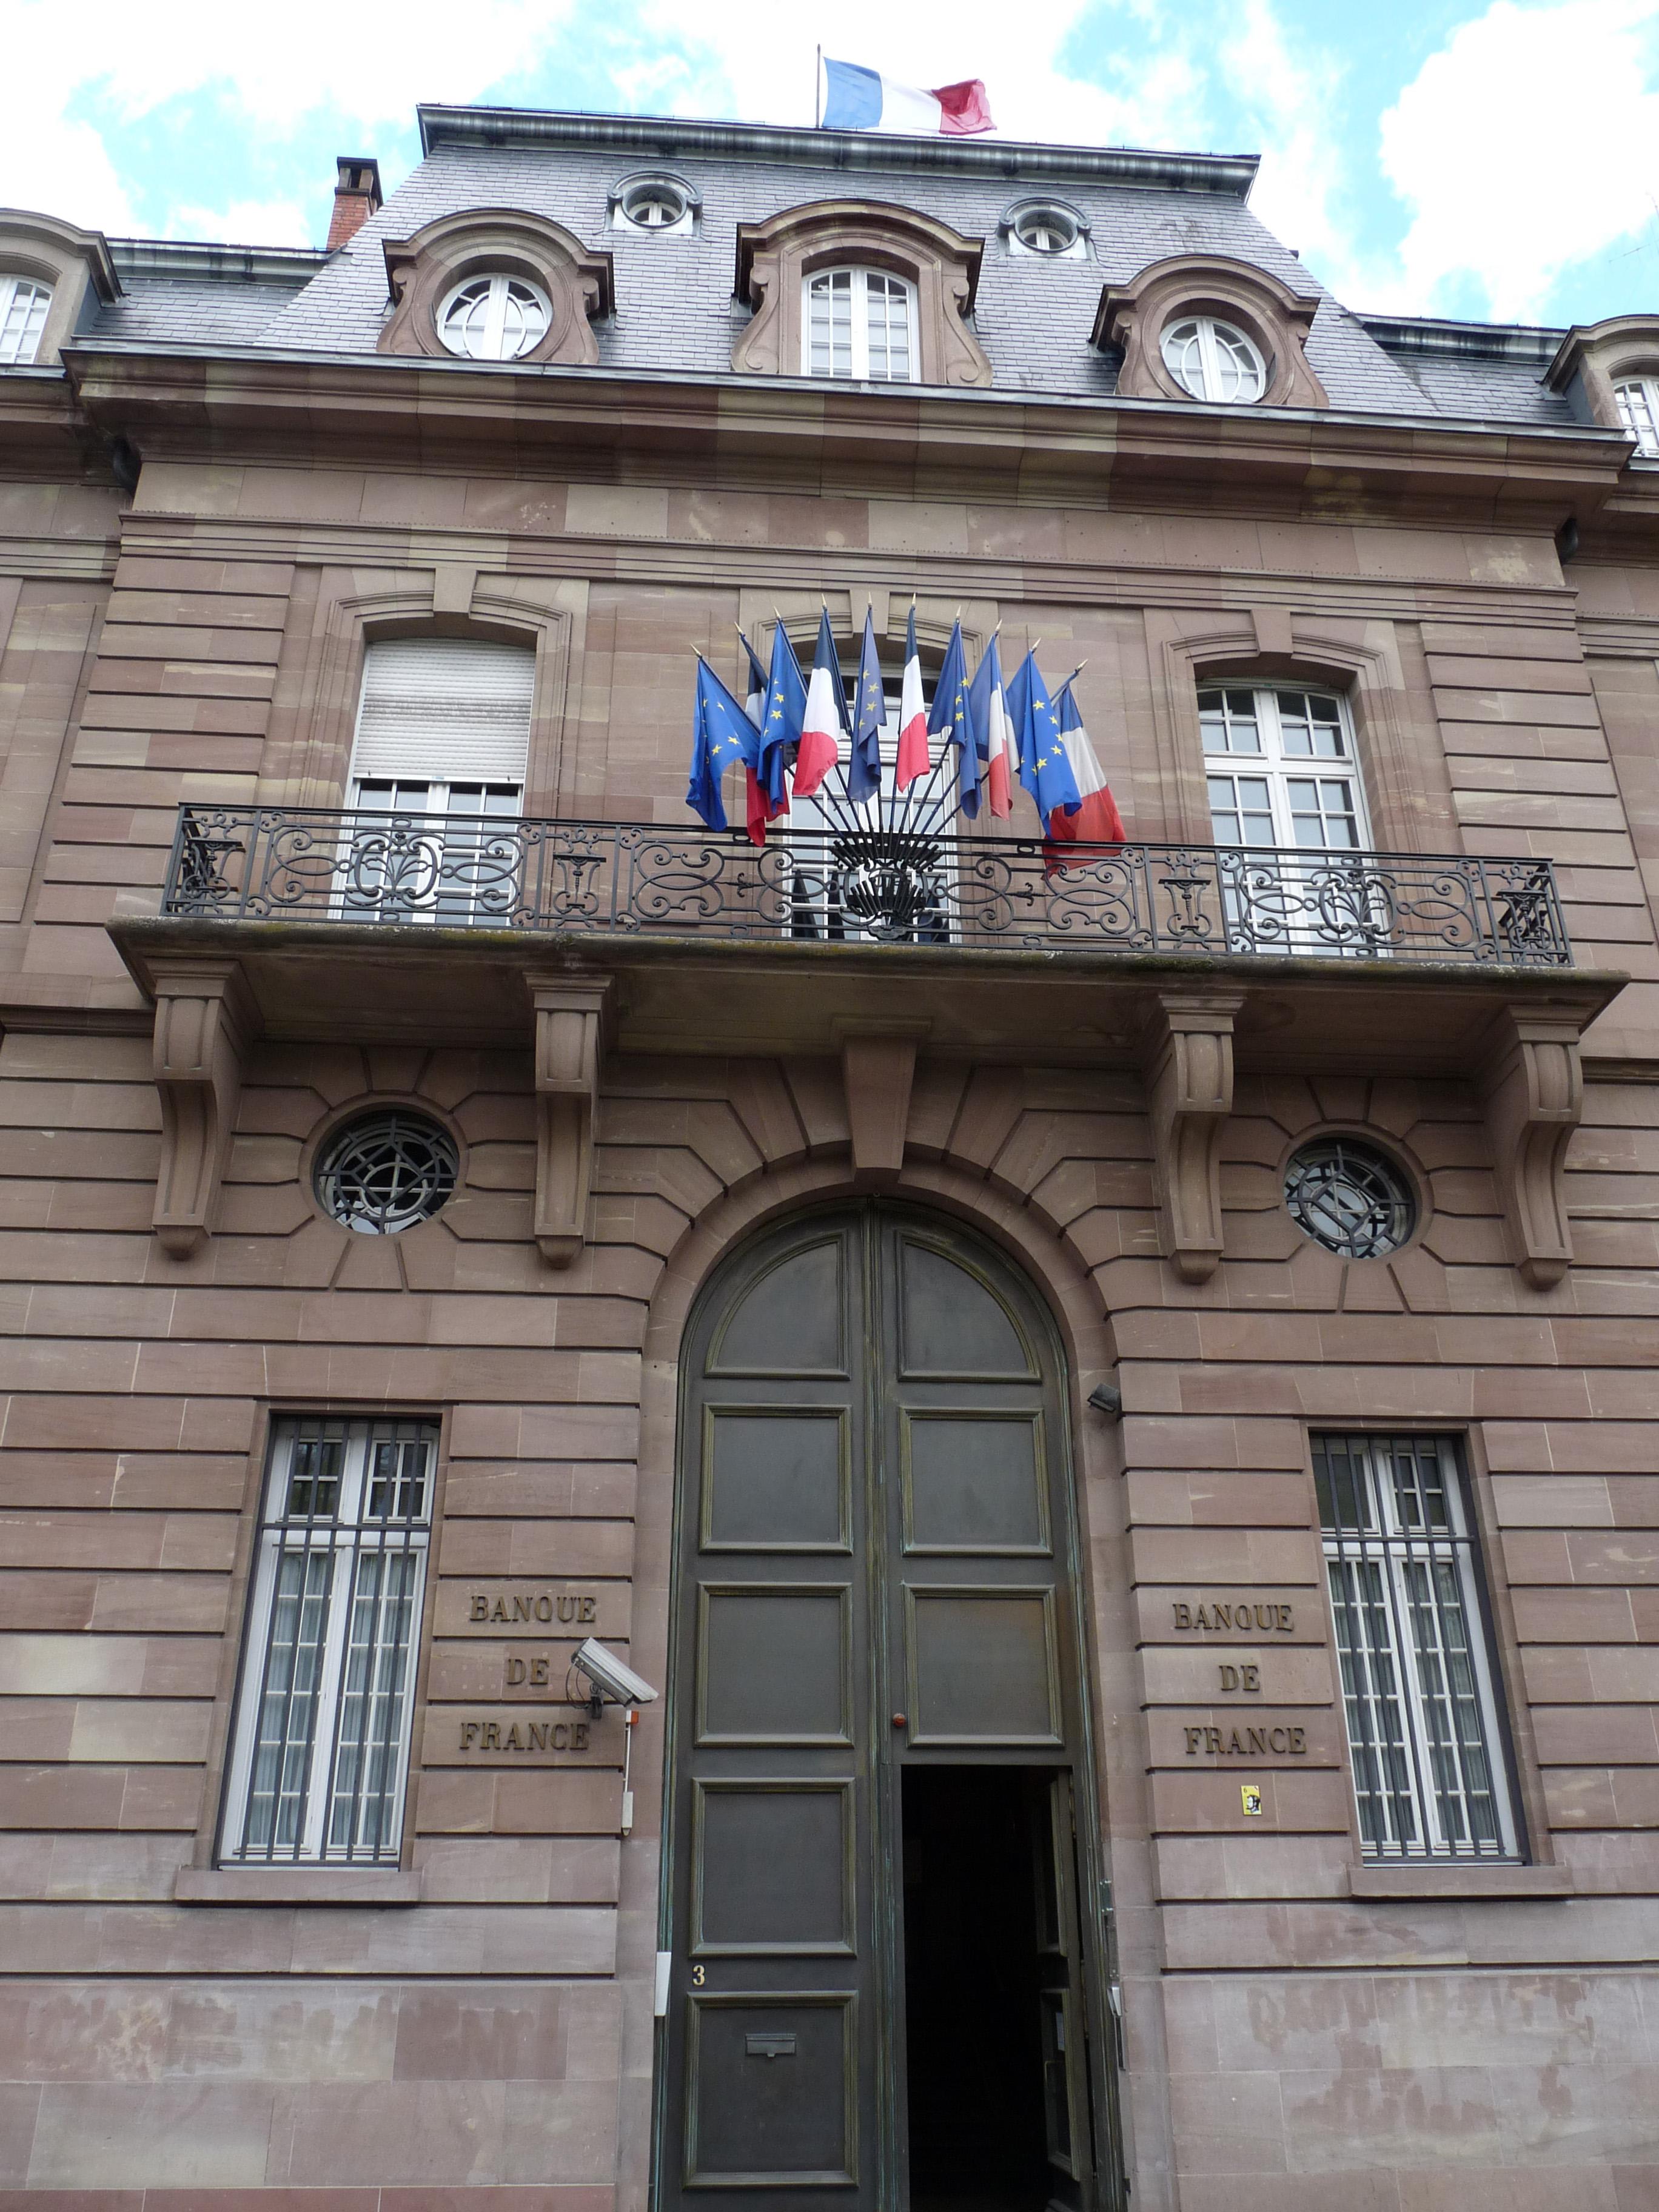 FileBanque de FranceStrasbourgjpg Wikimedia Commons